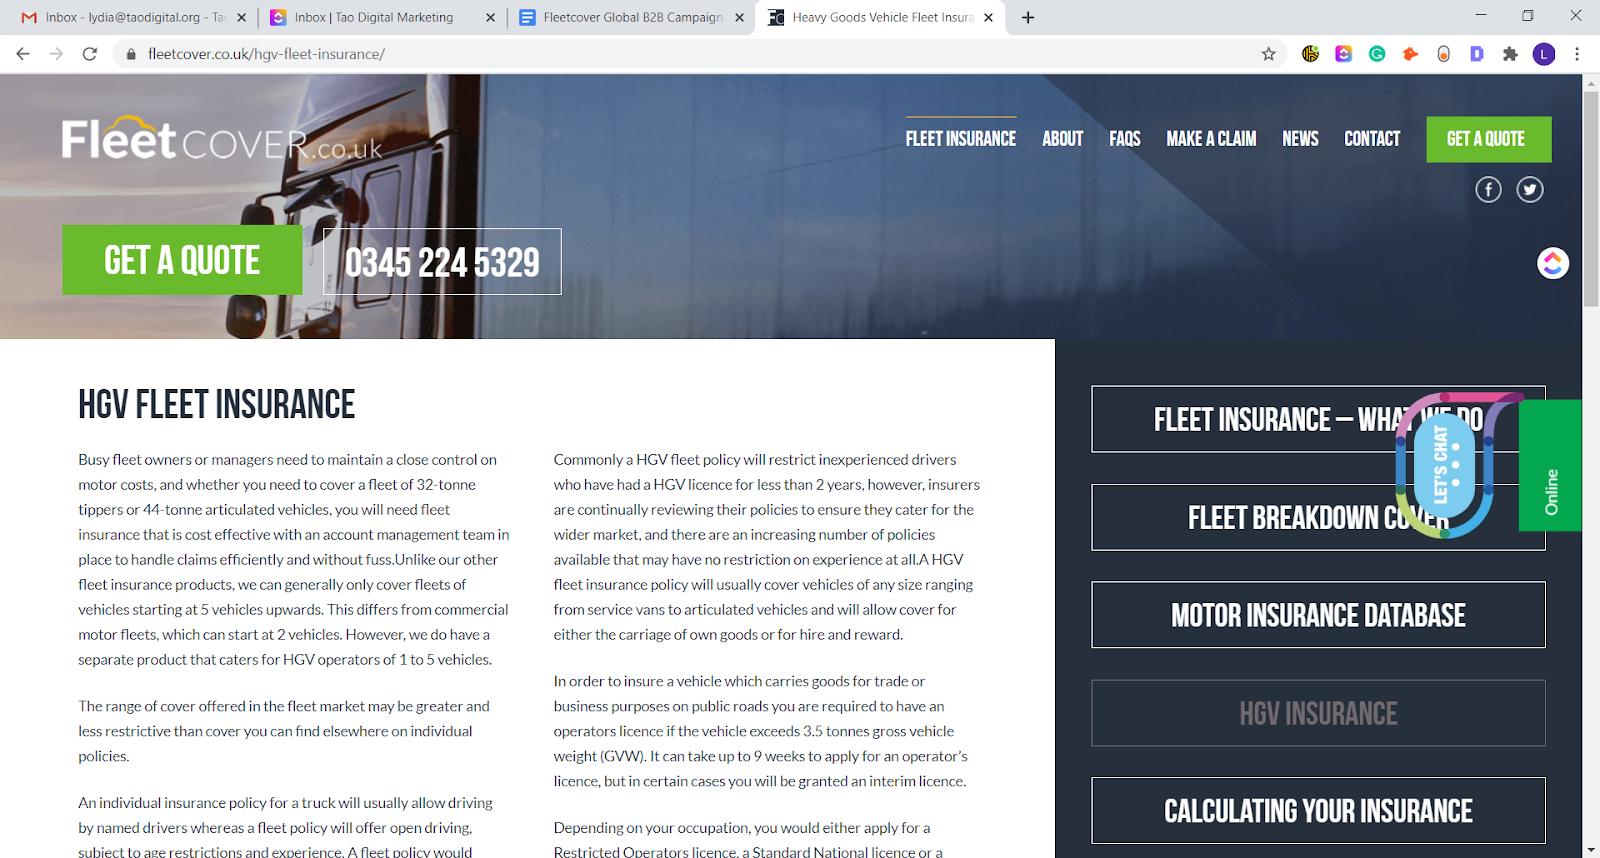 fleetcover hgv service page